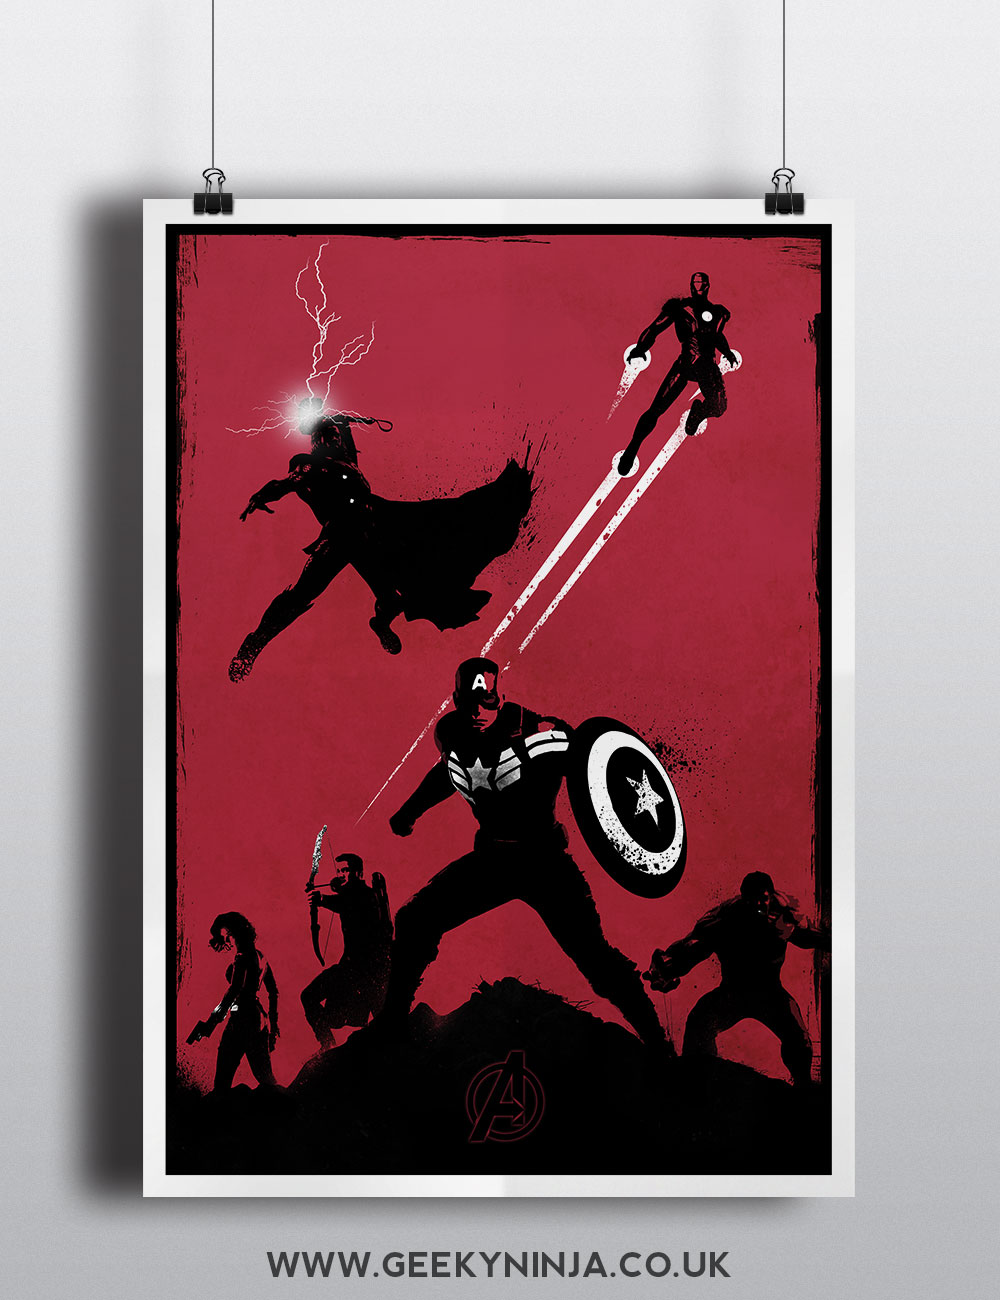 The avengers movie poster minimalist